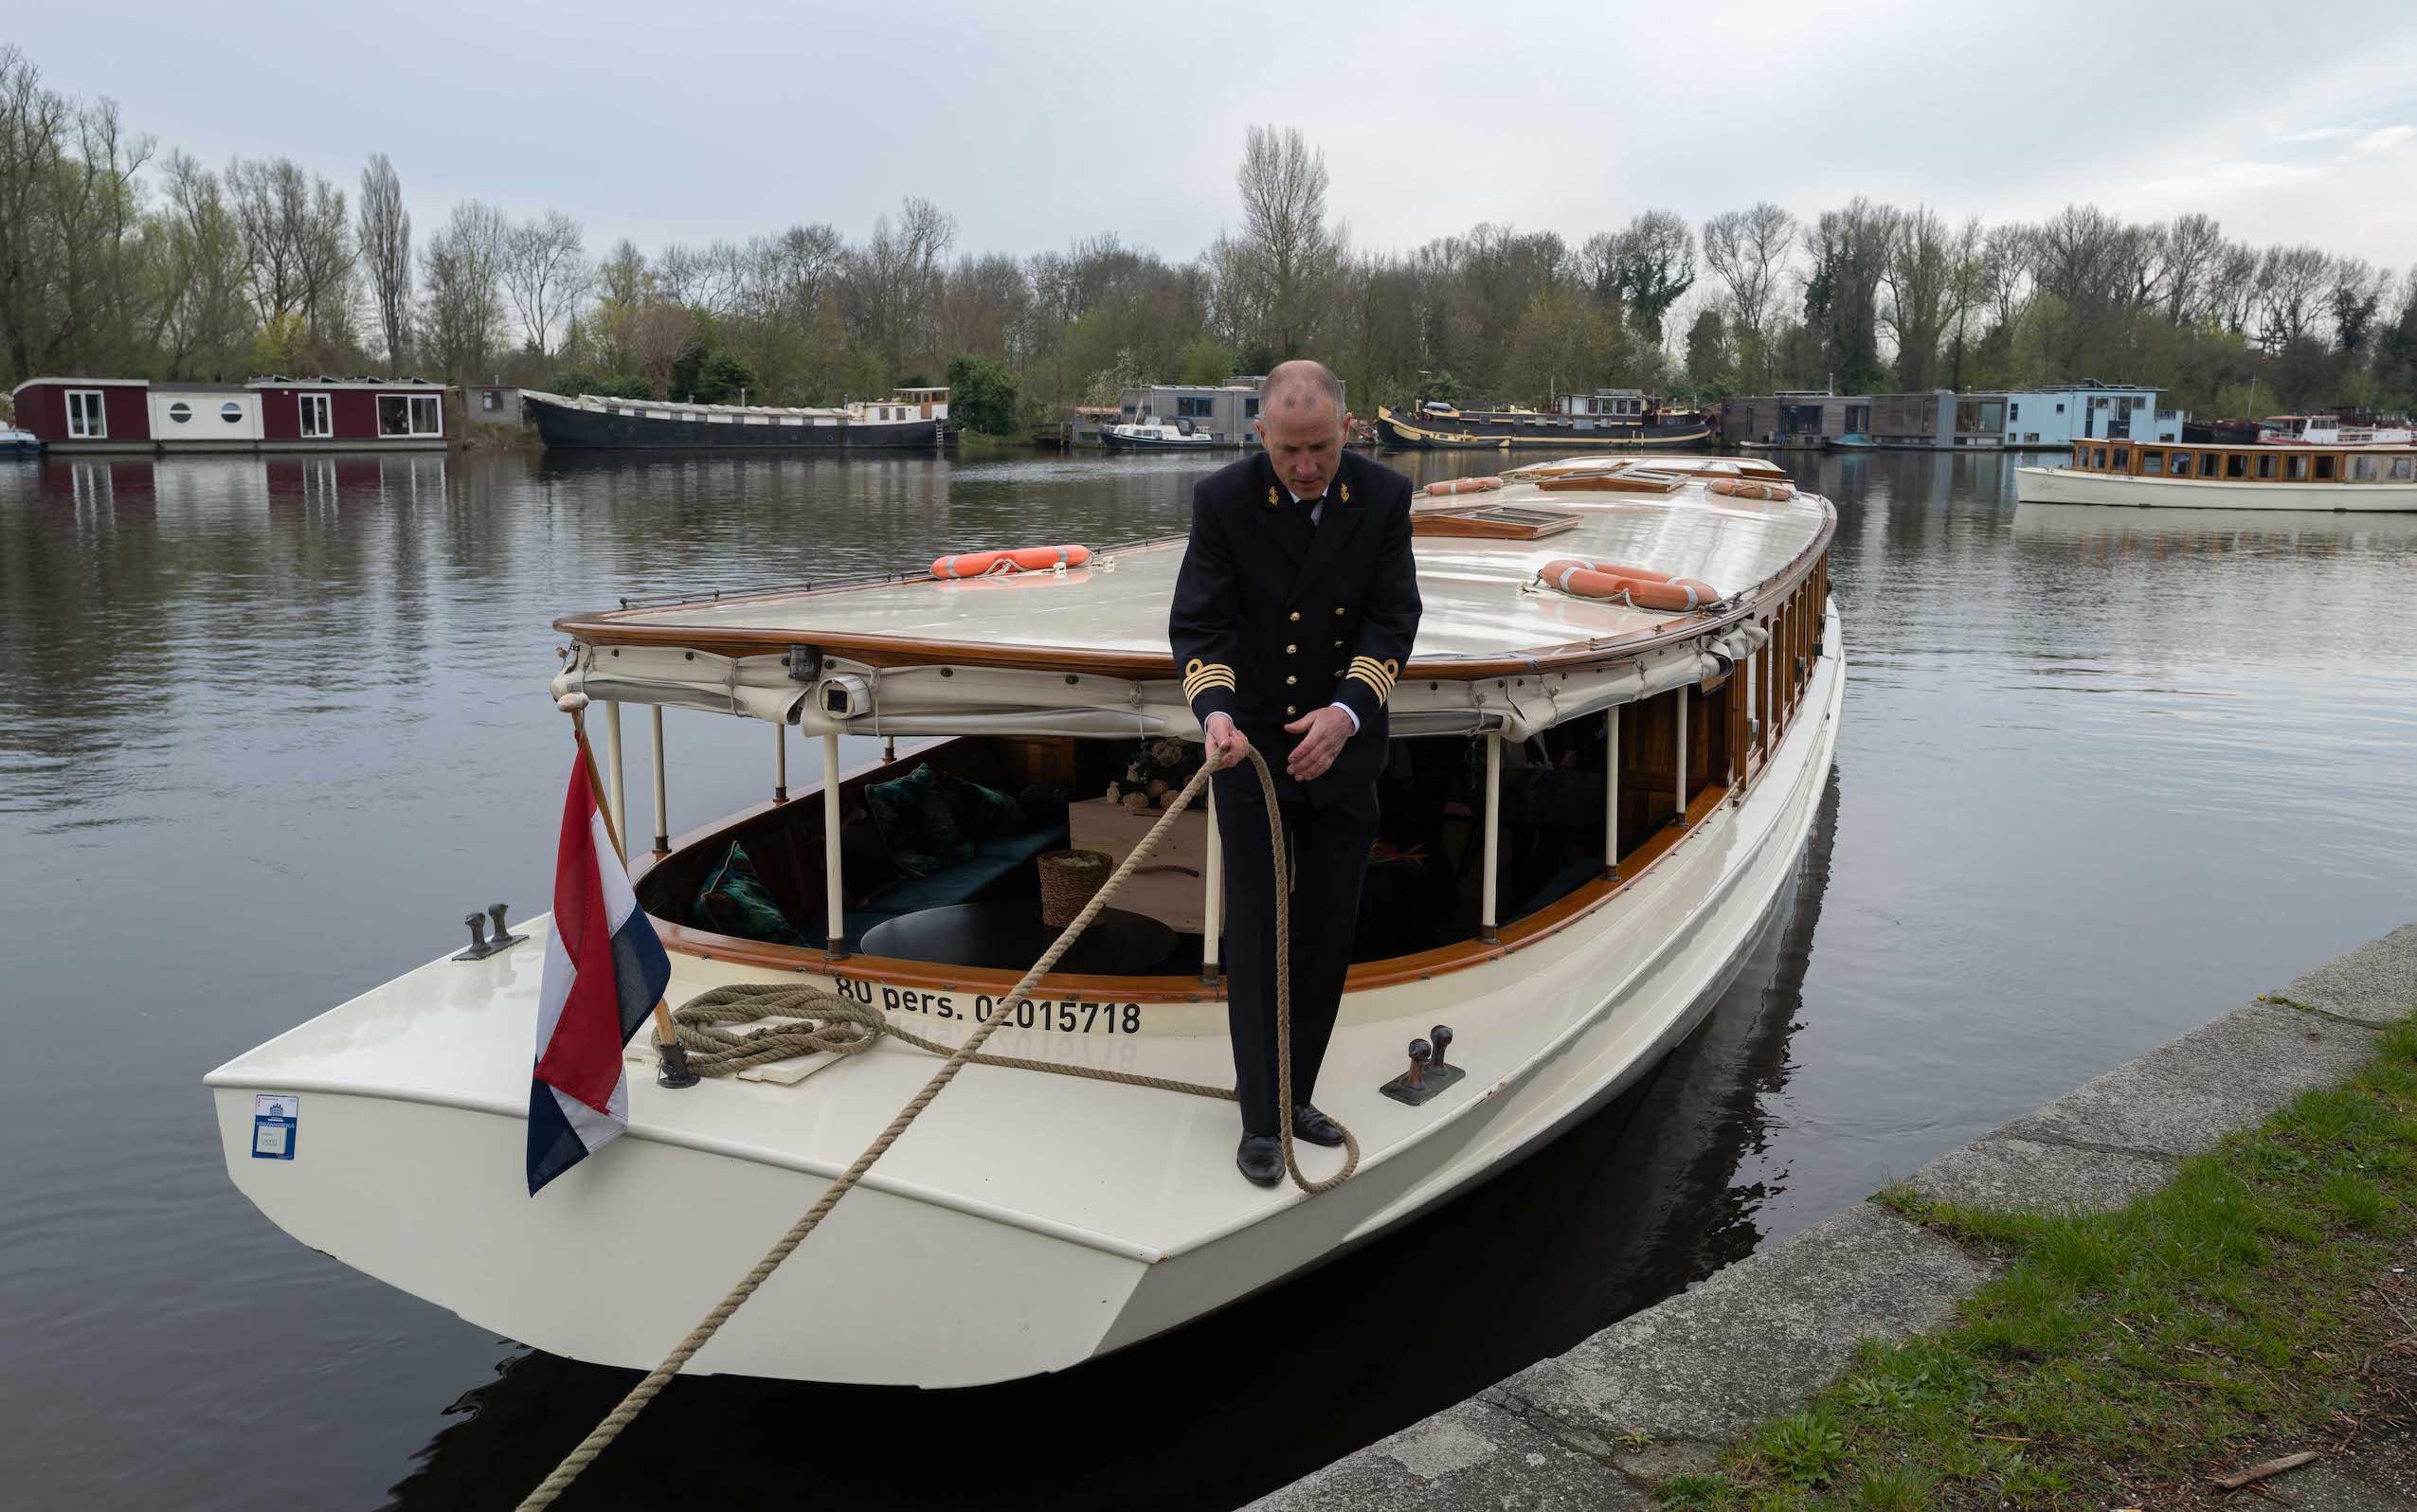 uitvaart per boot amstel zorgvlied kist salonboot wateruitvaart